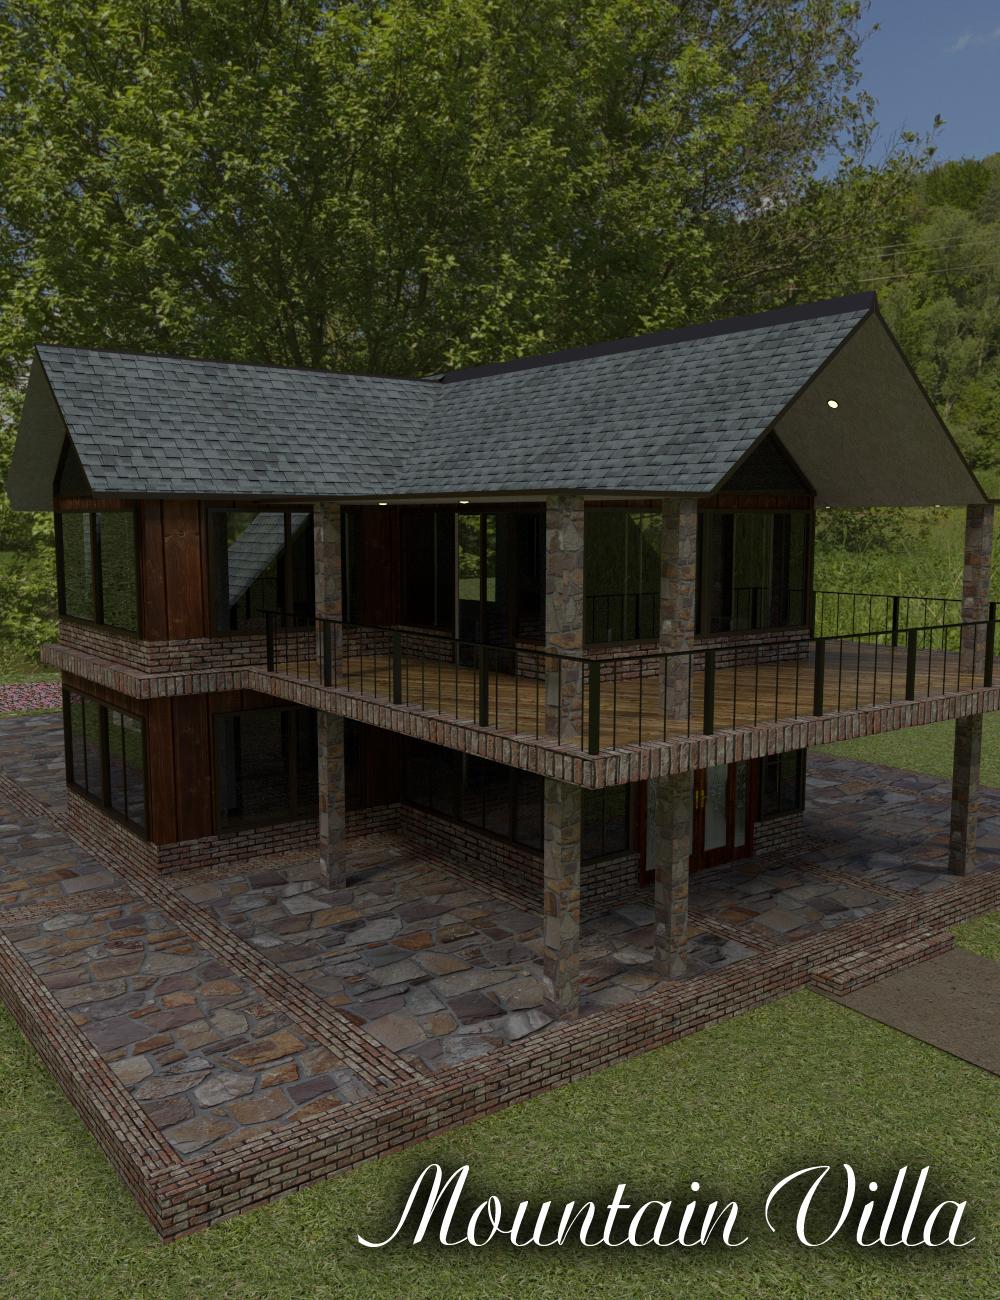 Mountain Villa by: ImagineX, 3D Models by Daz 3D